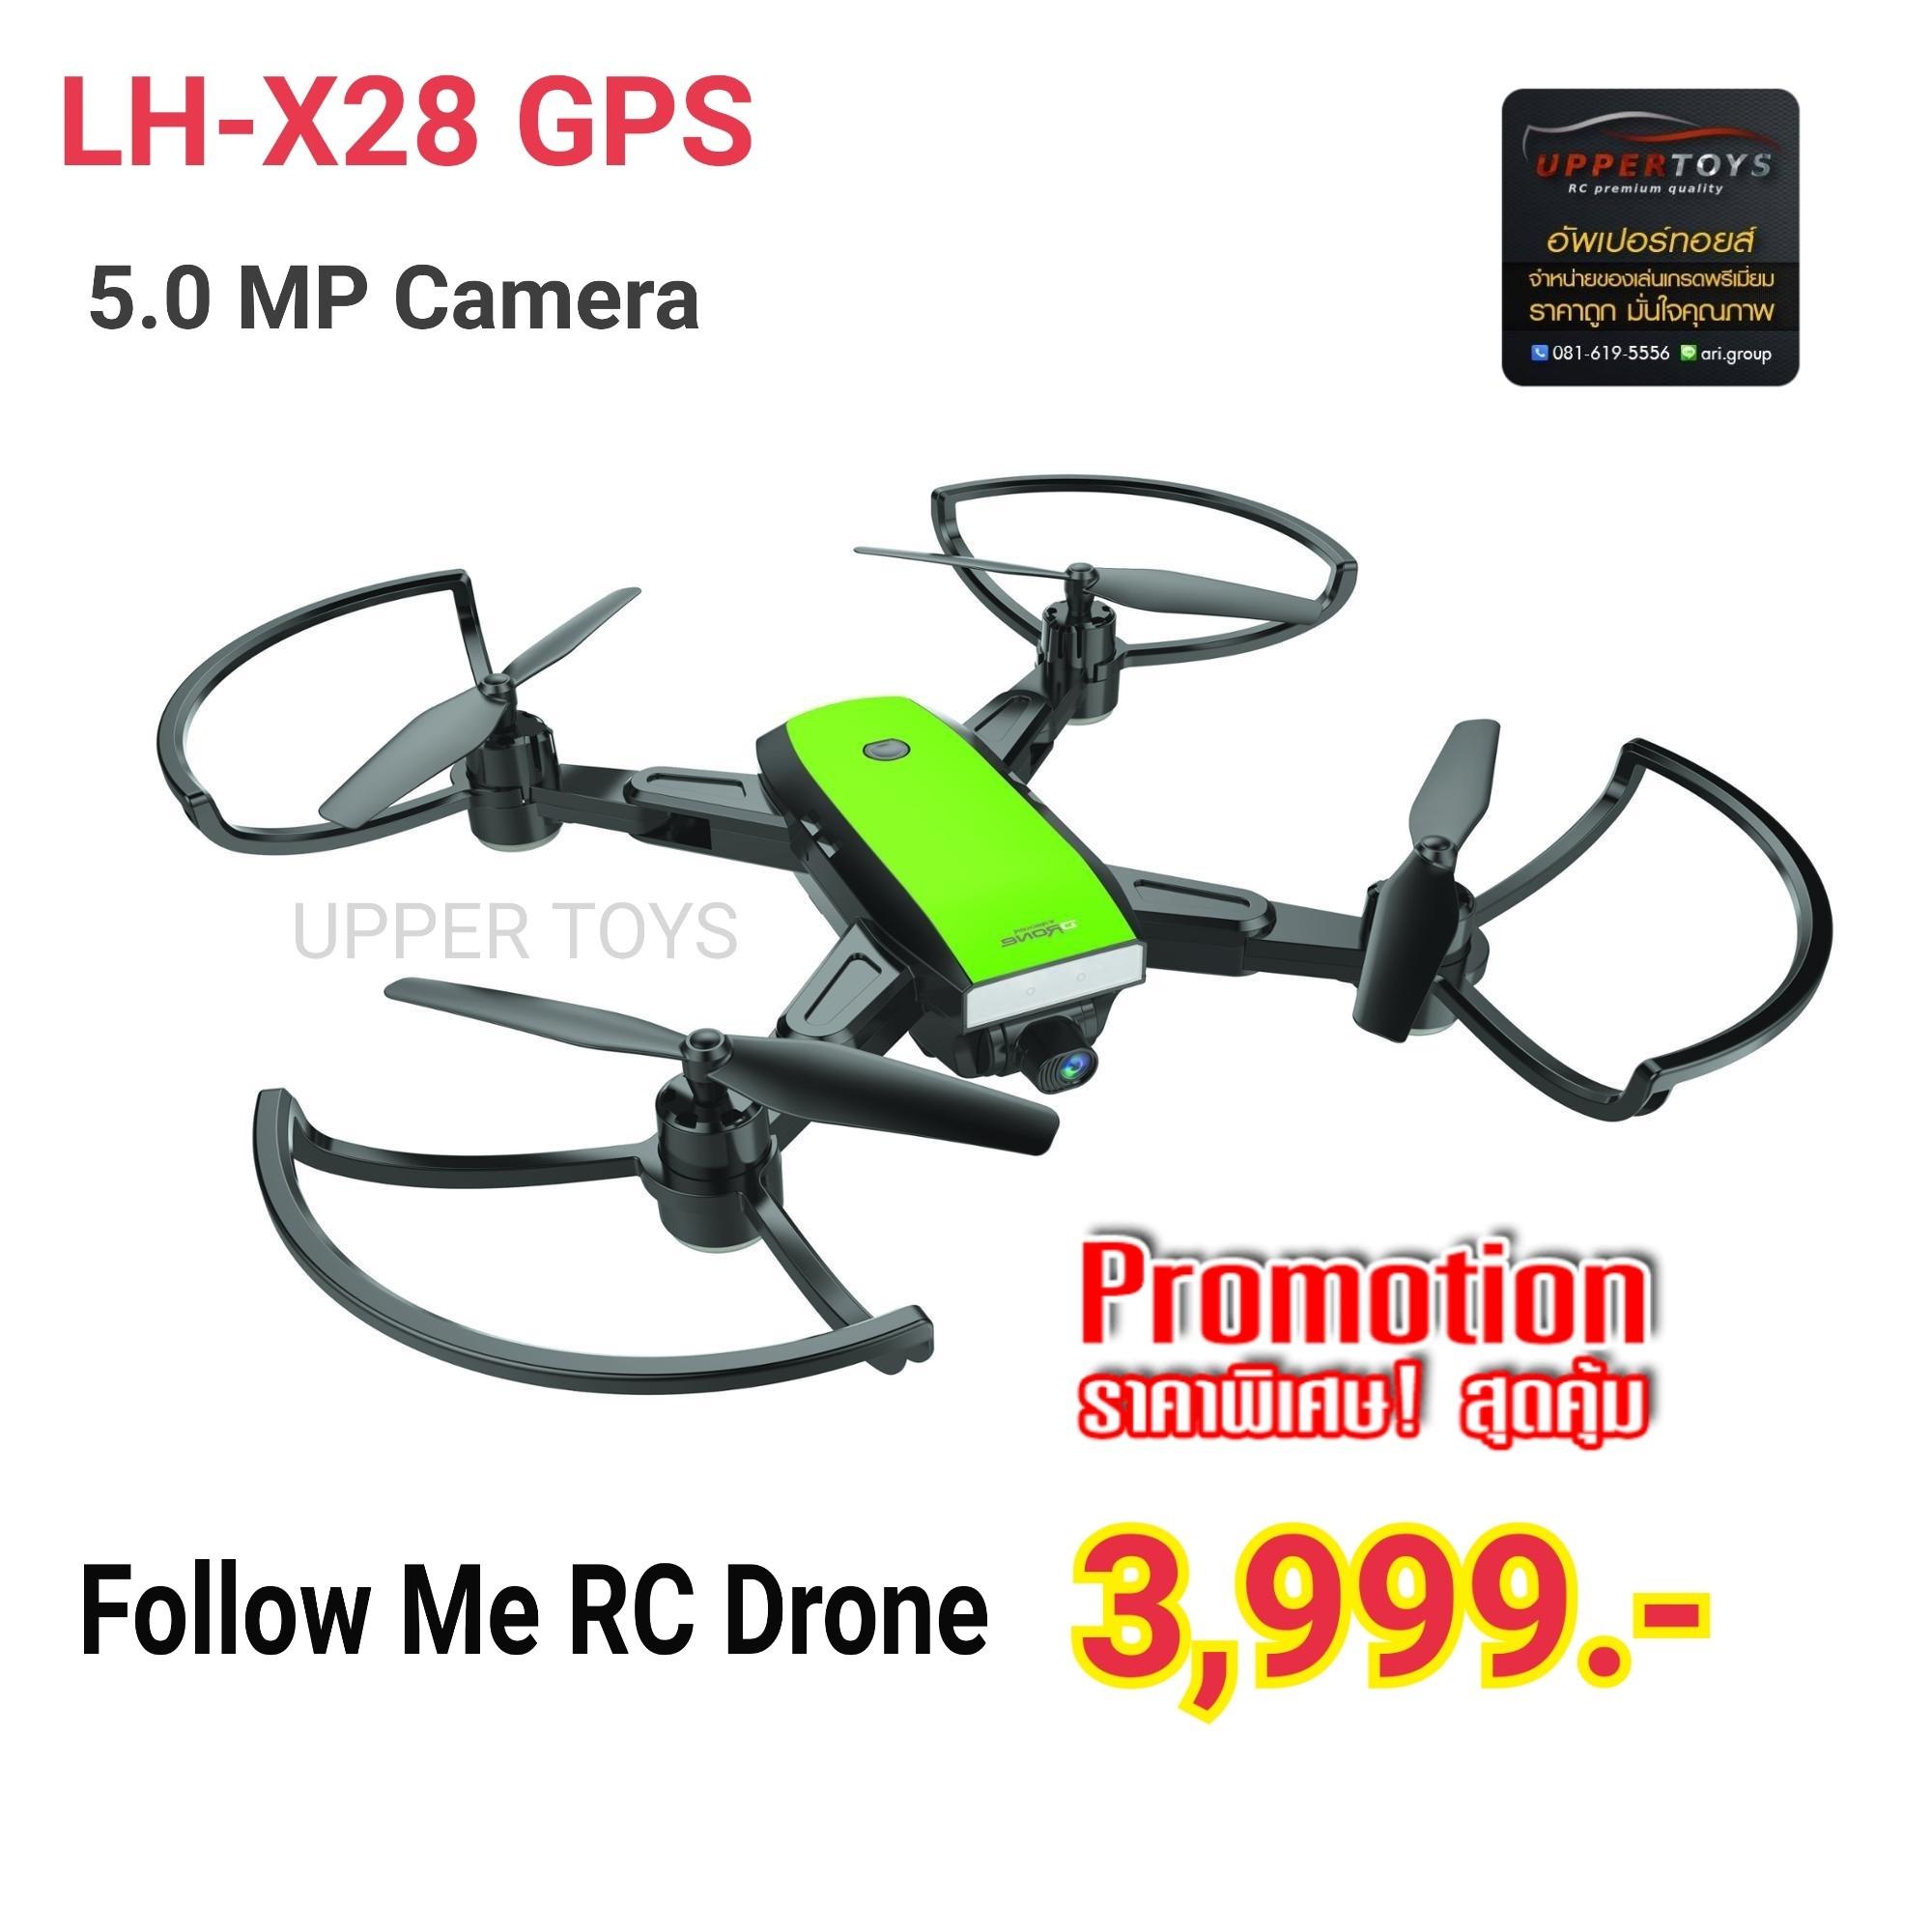 LH-X28 GPS ( spark clone ) 2.4G 4CH มีโหมดFollow Me 5.0MP CAMERA WIFI FPV CAMERA